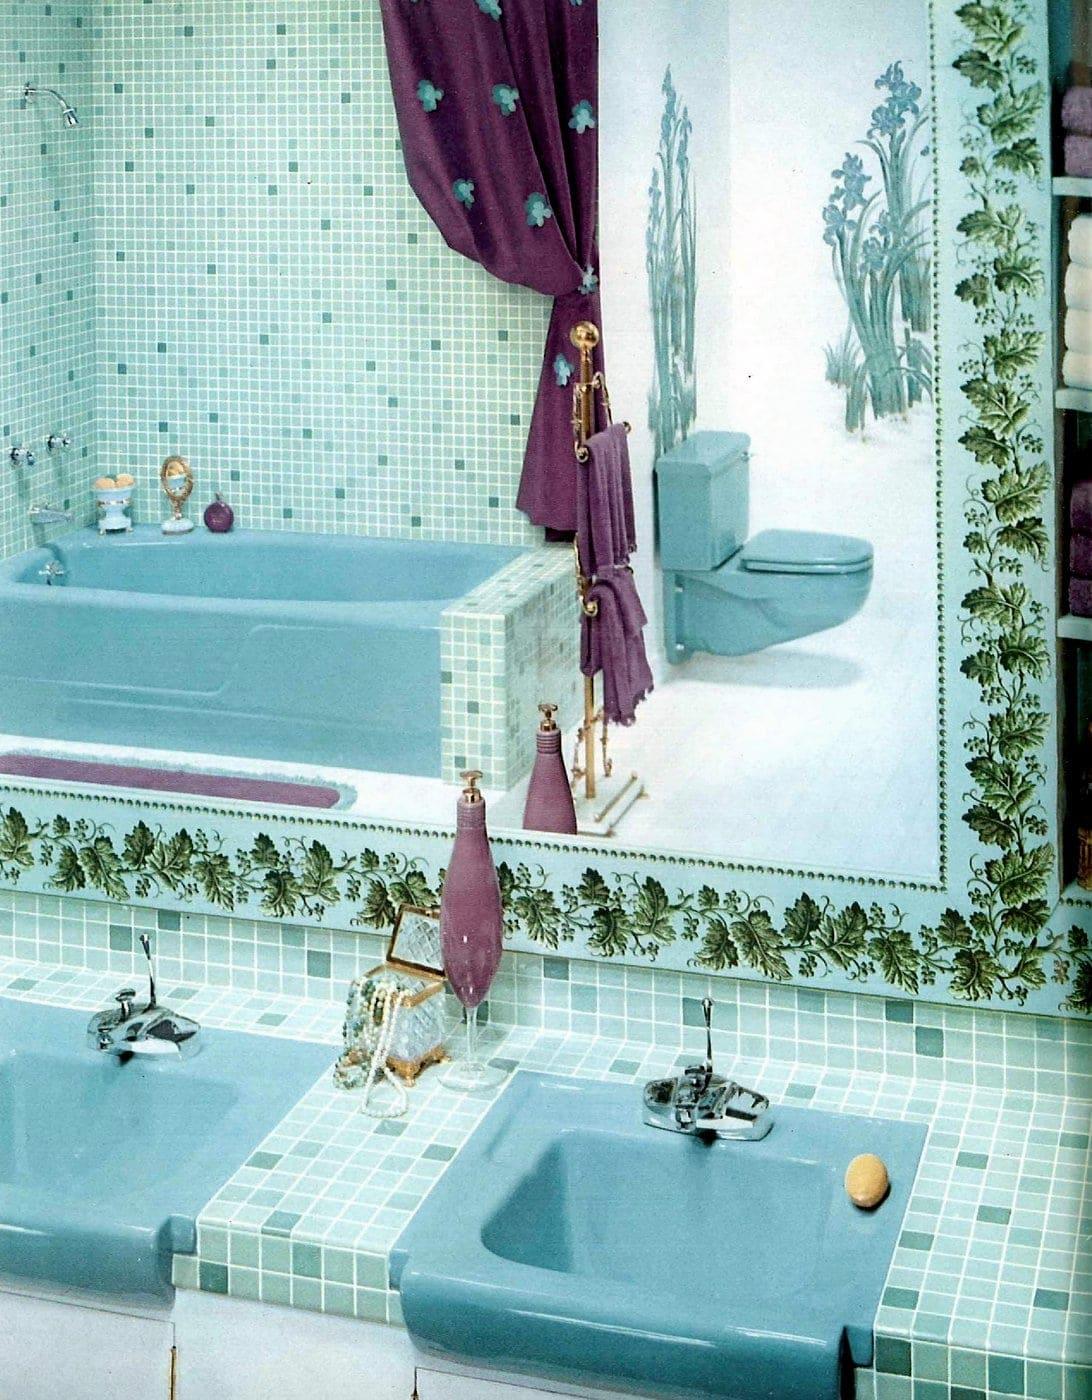 Vintage blue bathroom style ideas from 1962 (7)